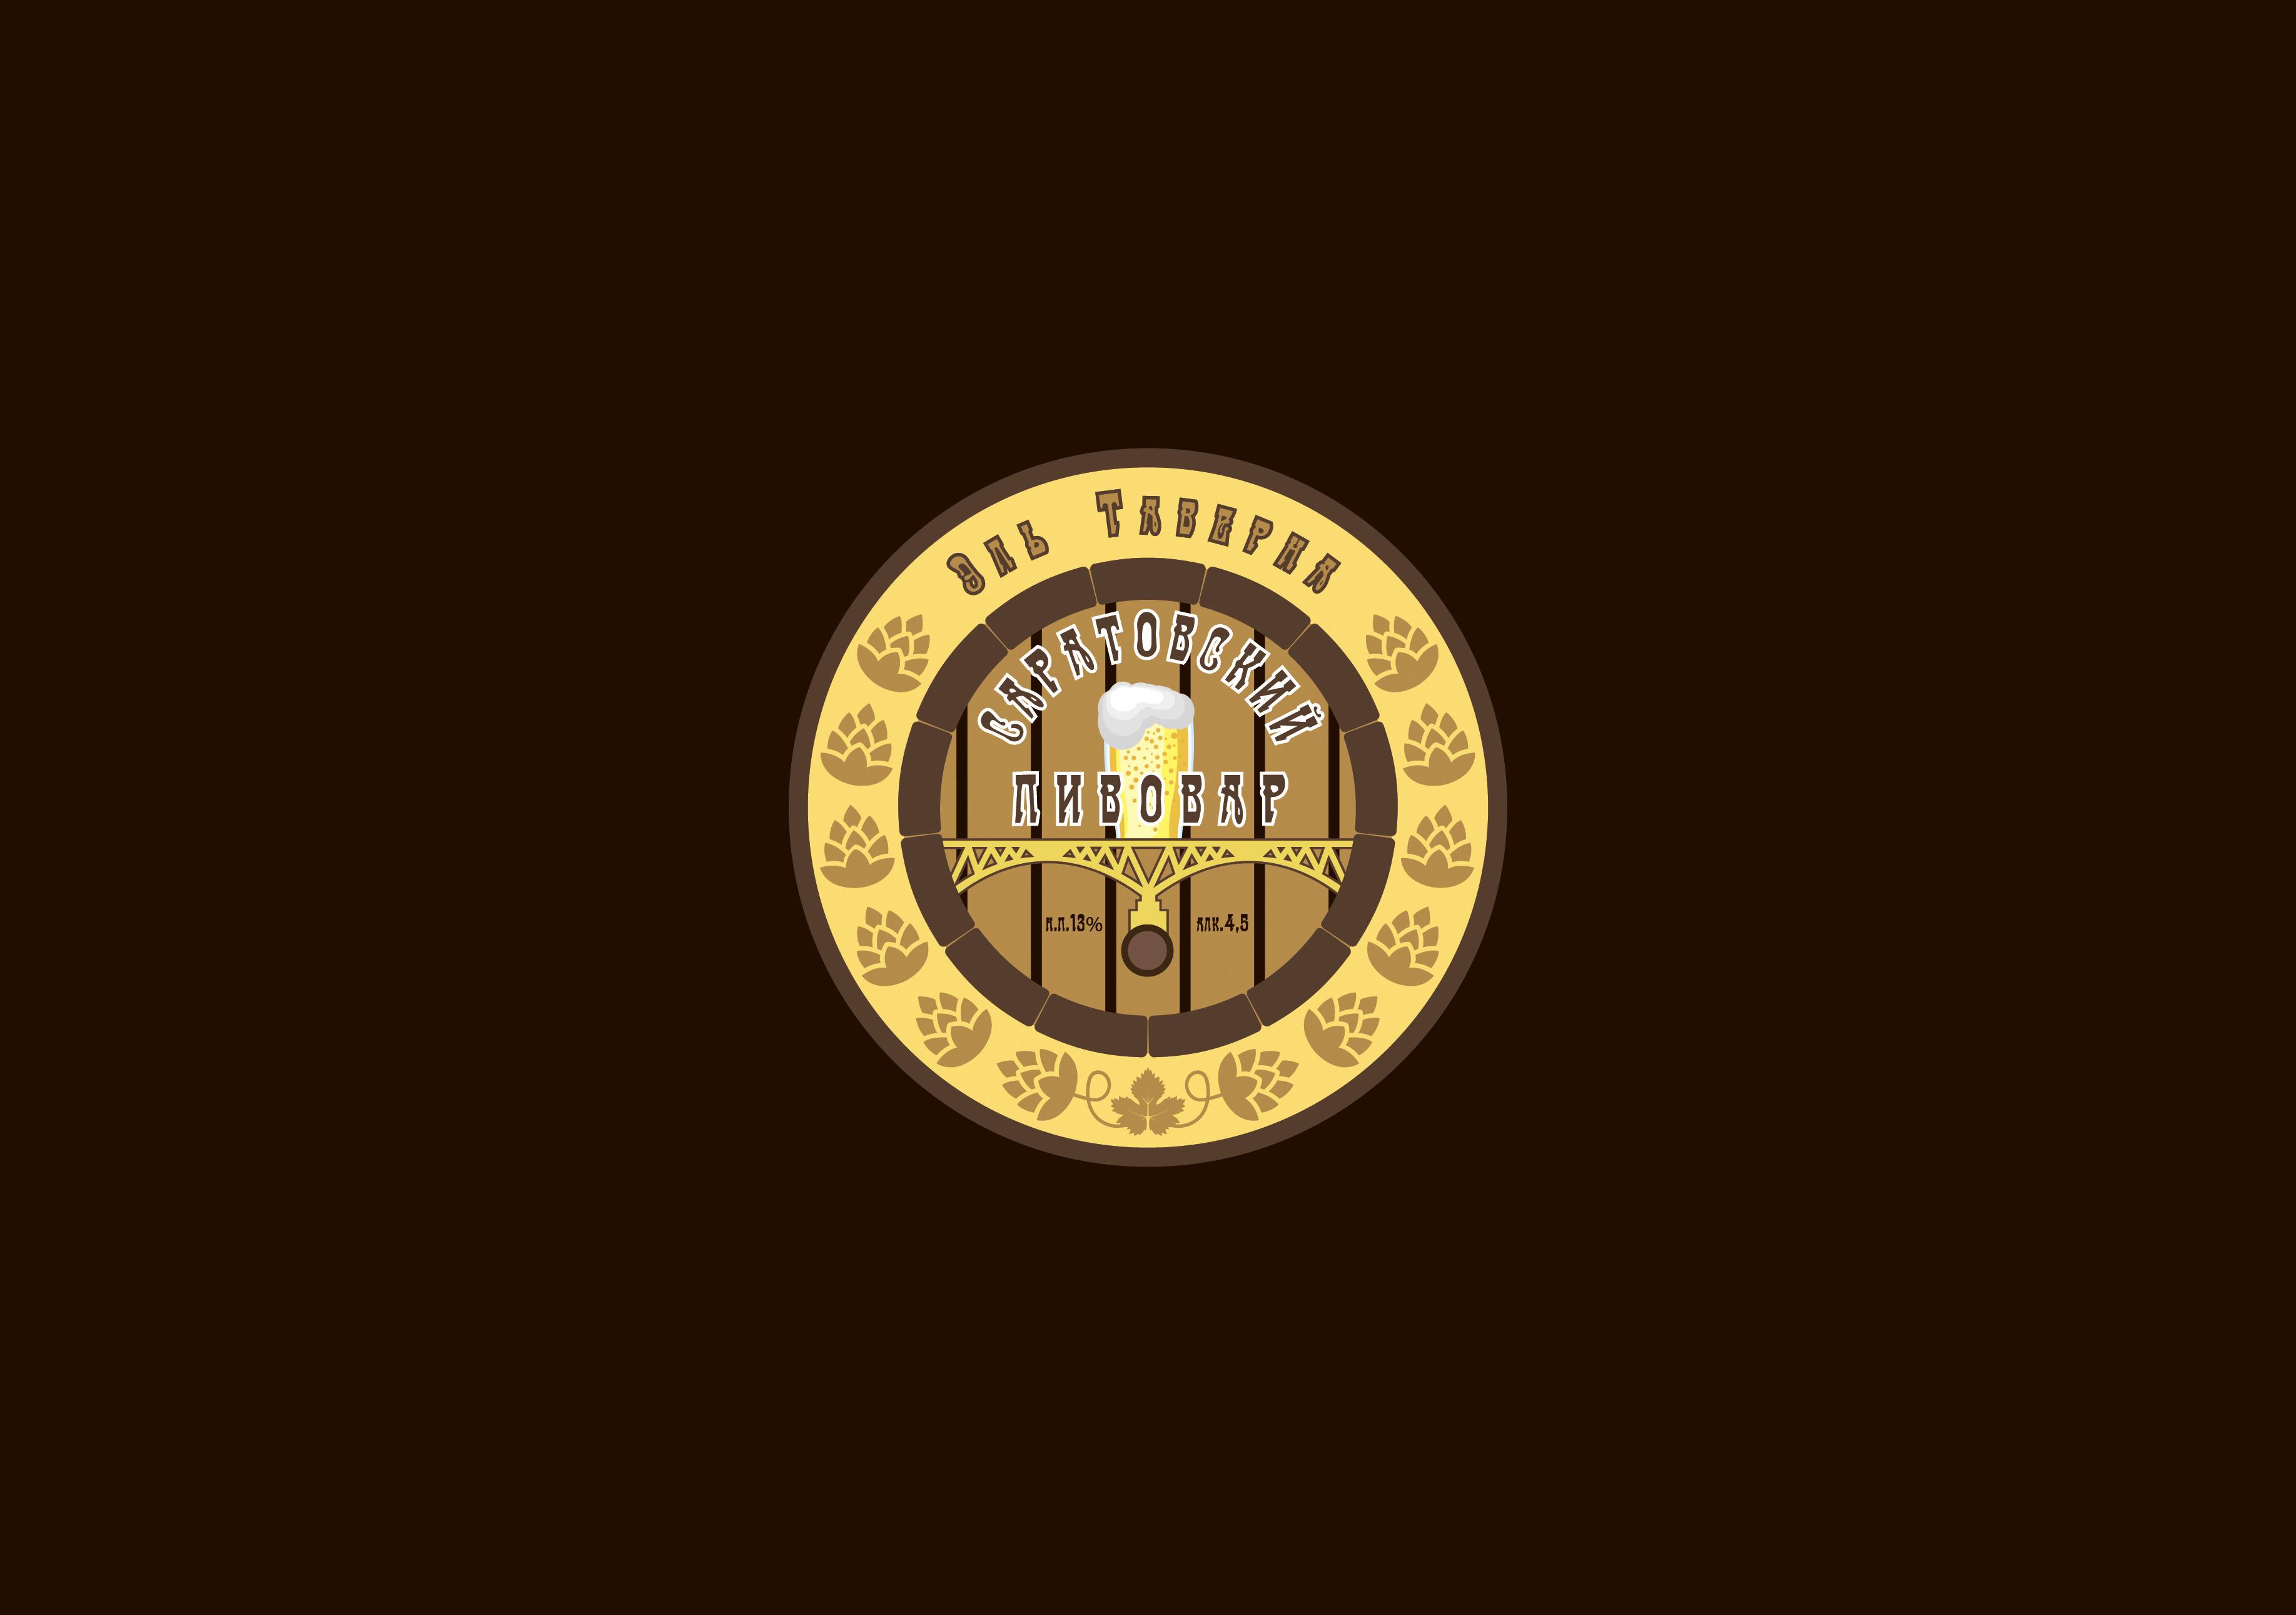 Разработка логотипа для частной пивоварни фото f_7695d78f442726a8.jpg